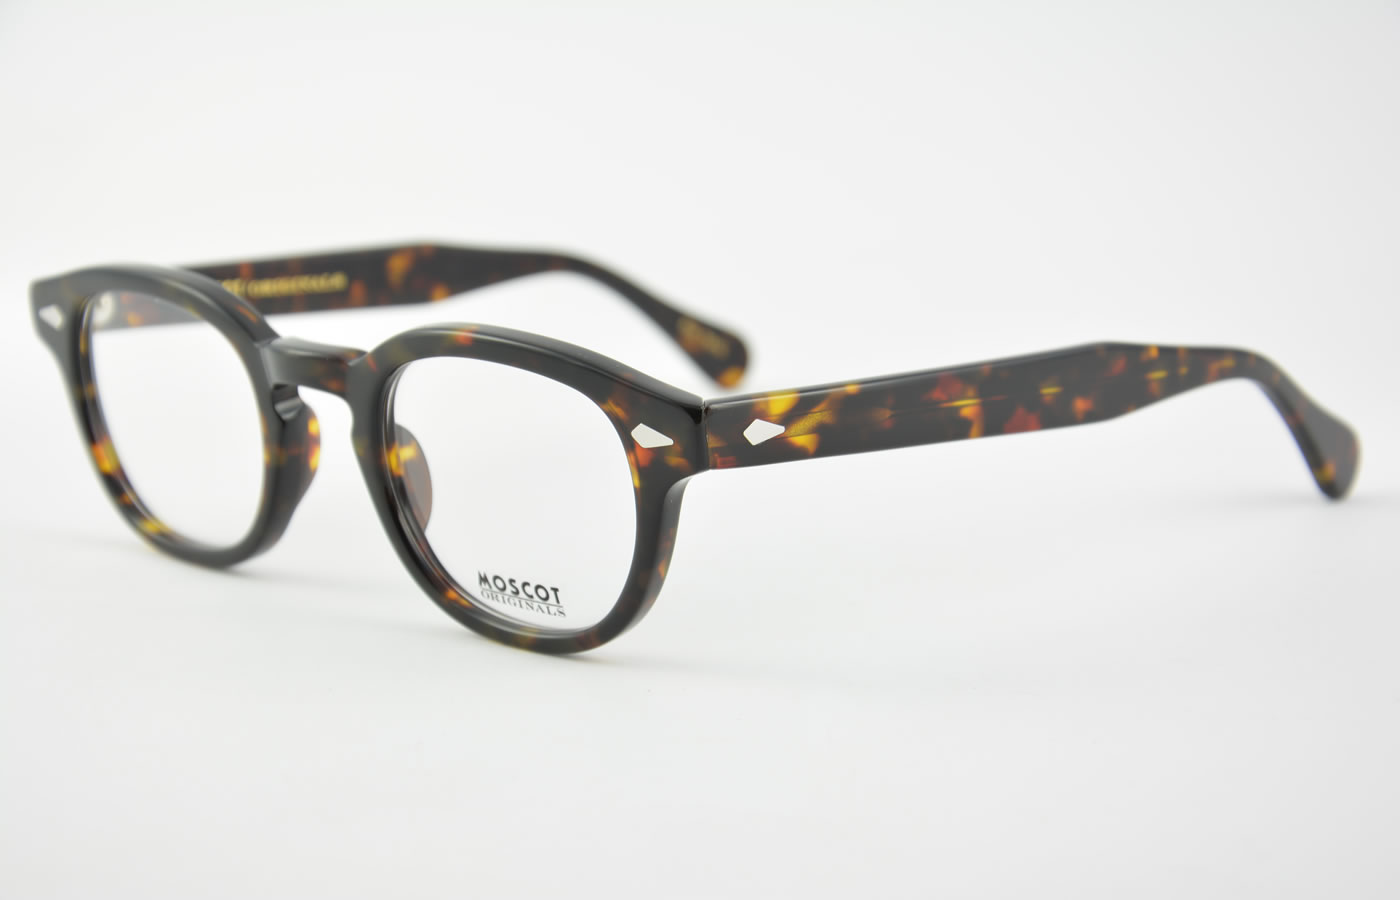 7fb4cae0815 Moscot Lemtosh Tortoise Sunglasses - Bitterroot Public Library